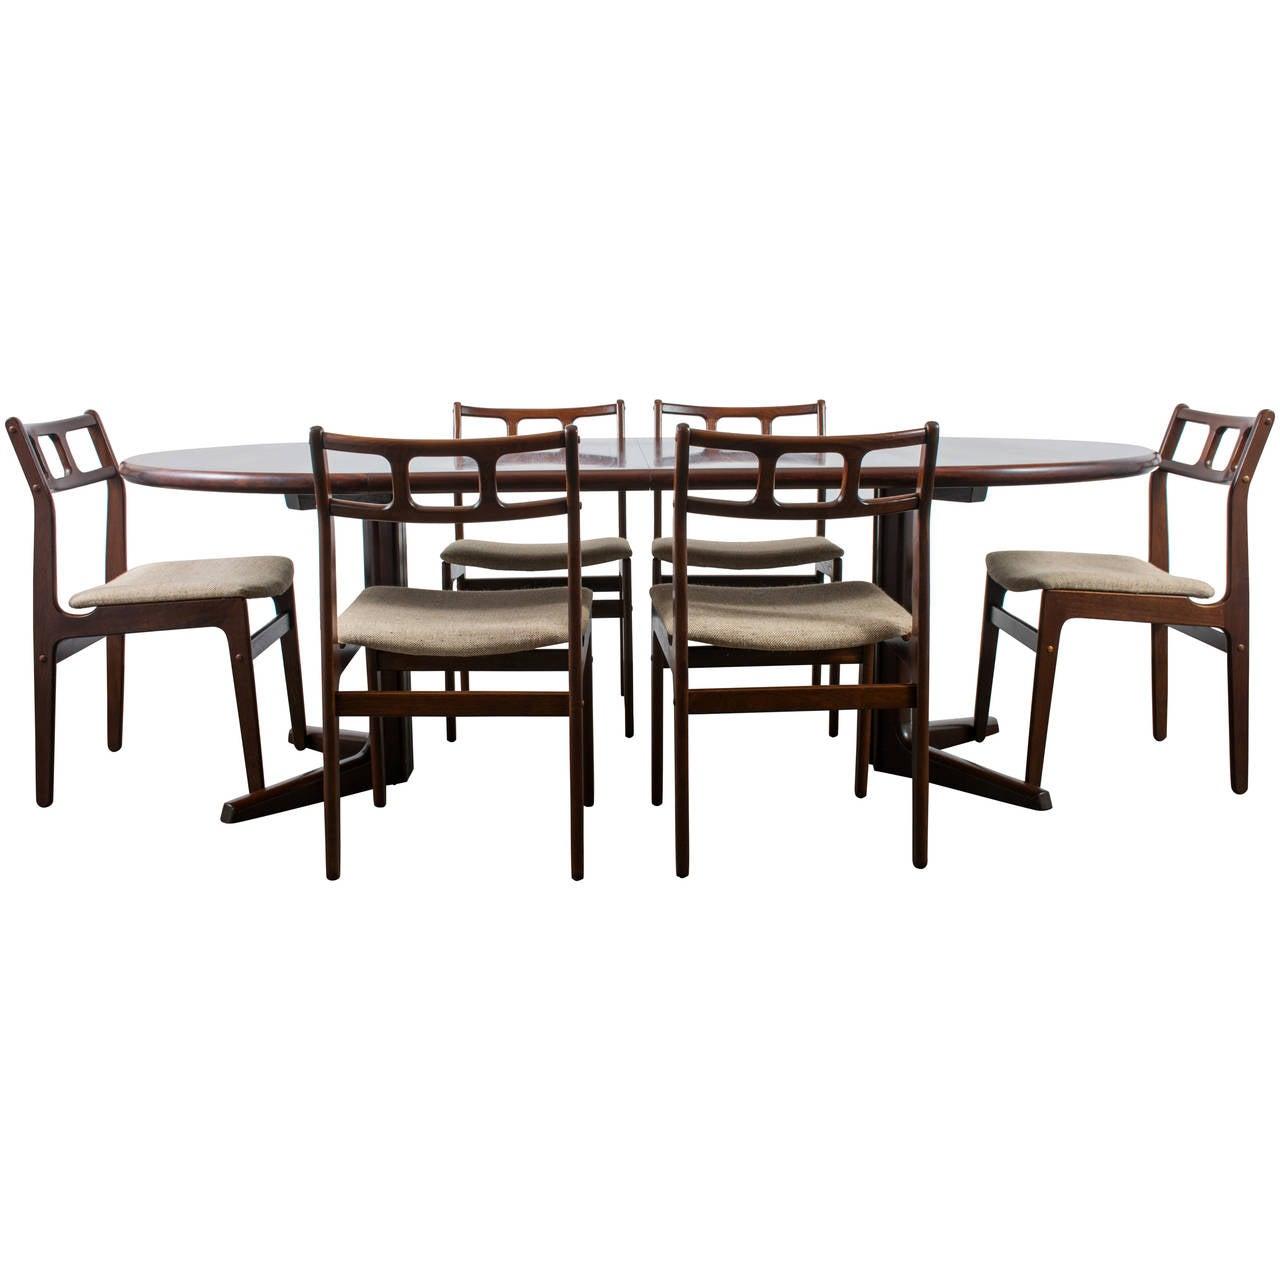 Danish Modern Rosewood Dining Set By Dyrlund At 1stdibs